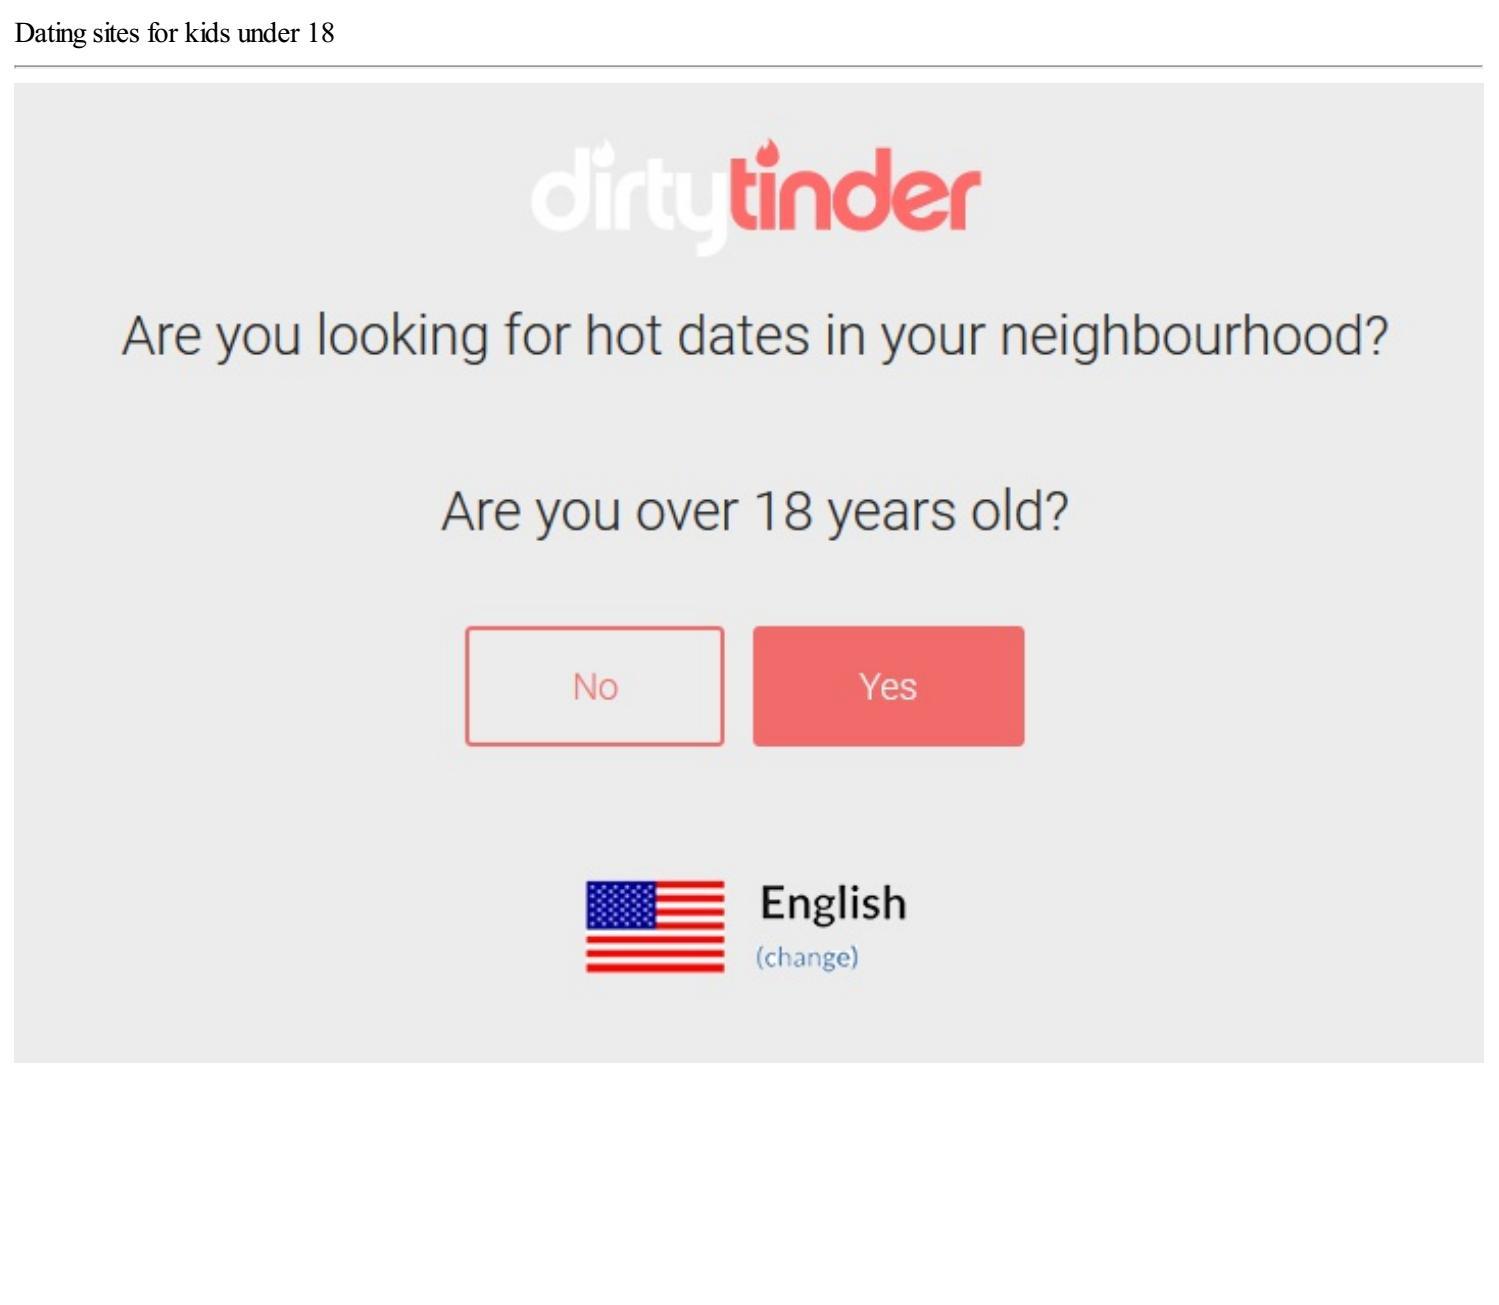 under 18 dating